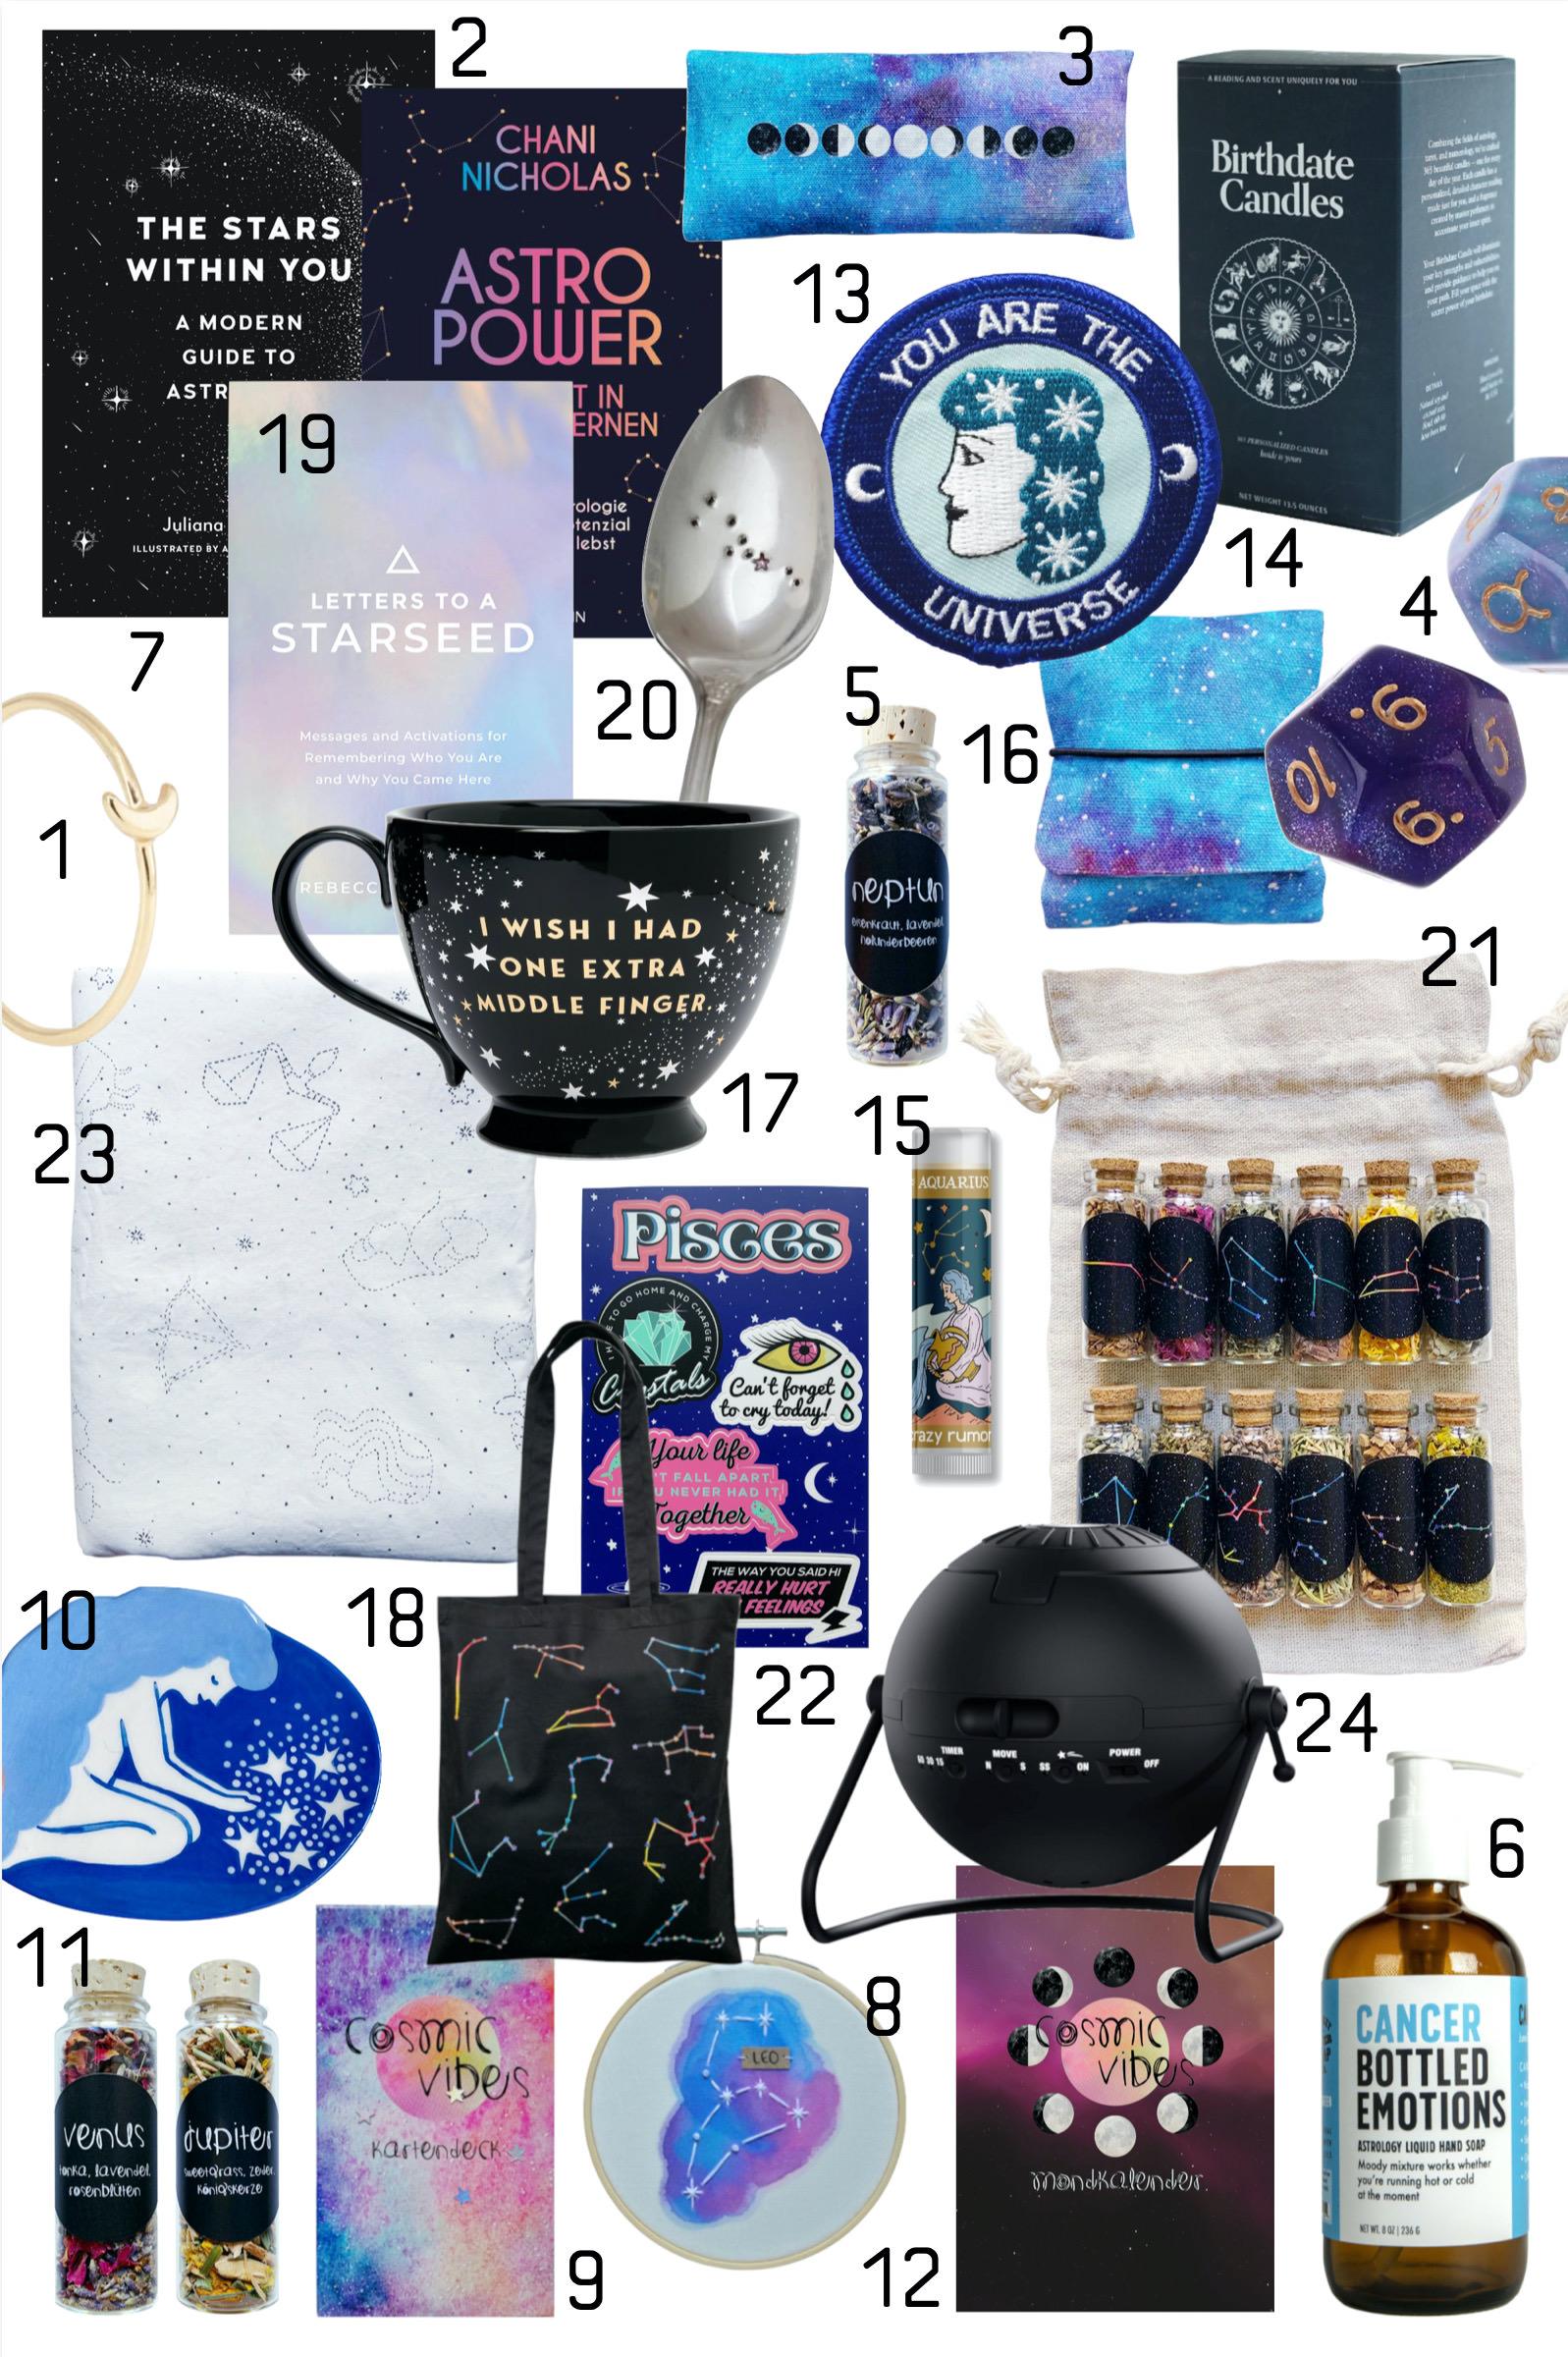 Adventskalender 2021 Astrologie Geschenke